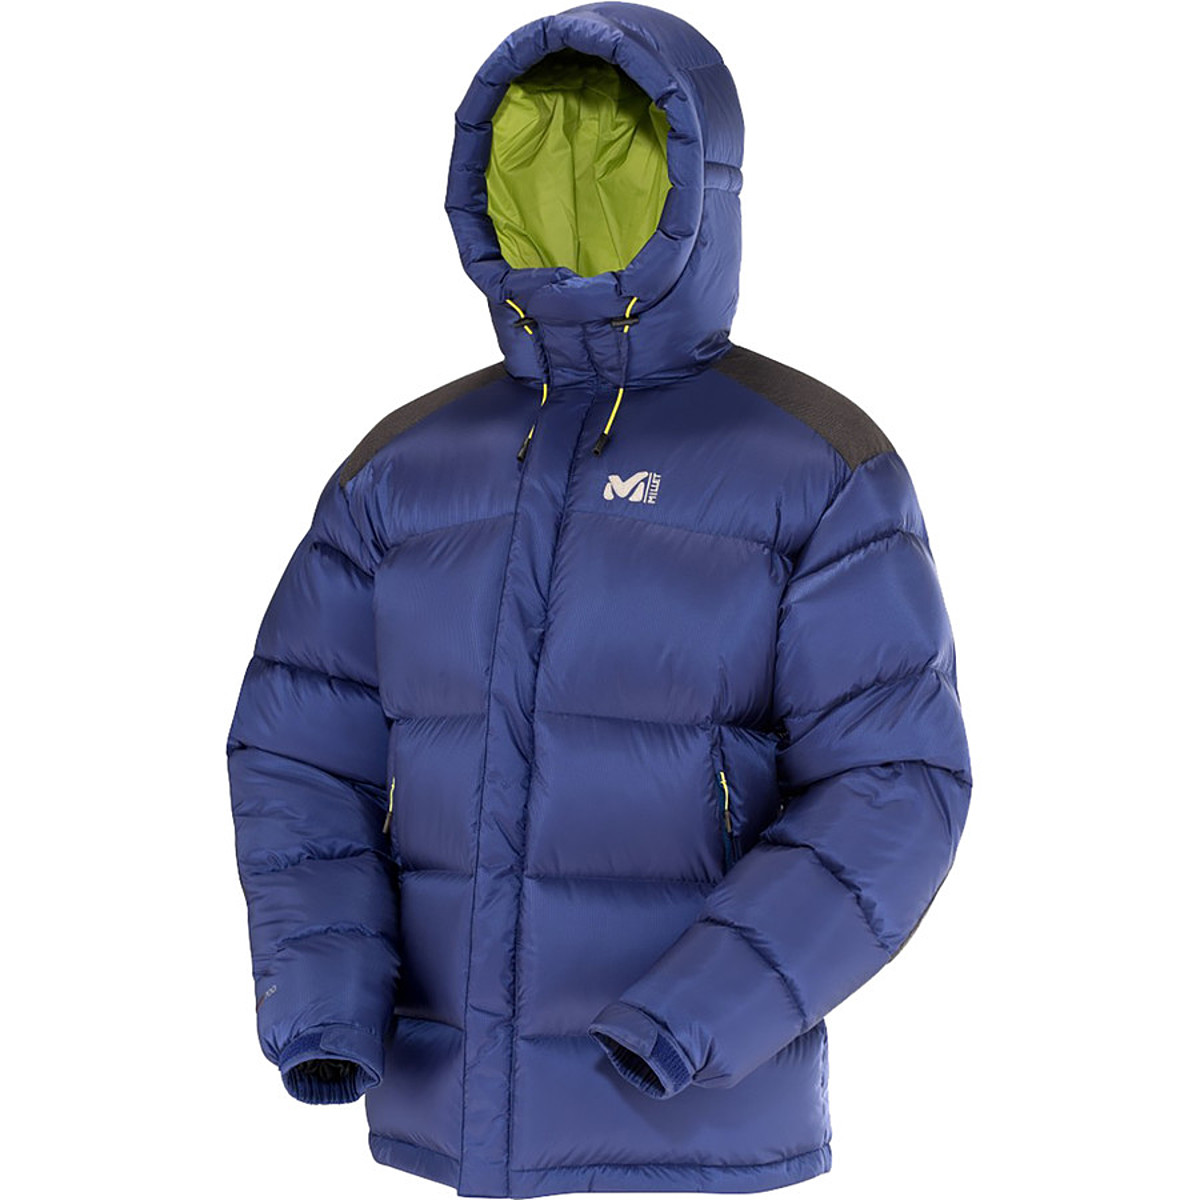 Millet Expert Pro Jacket